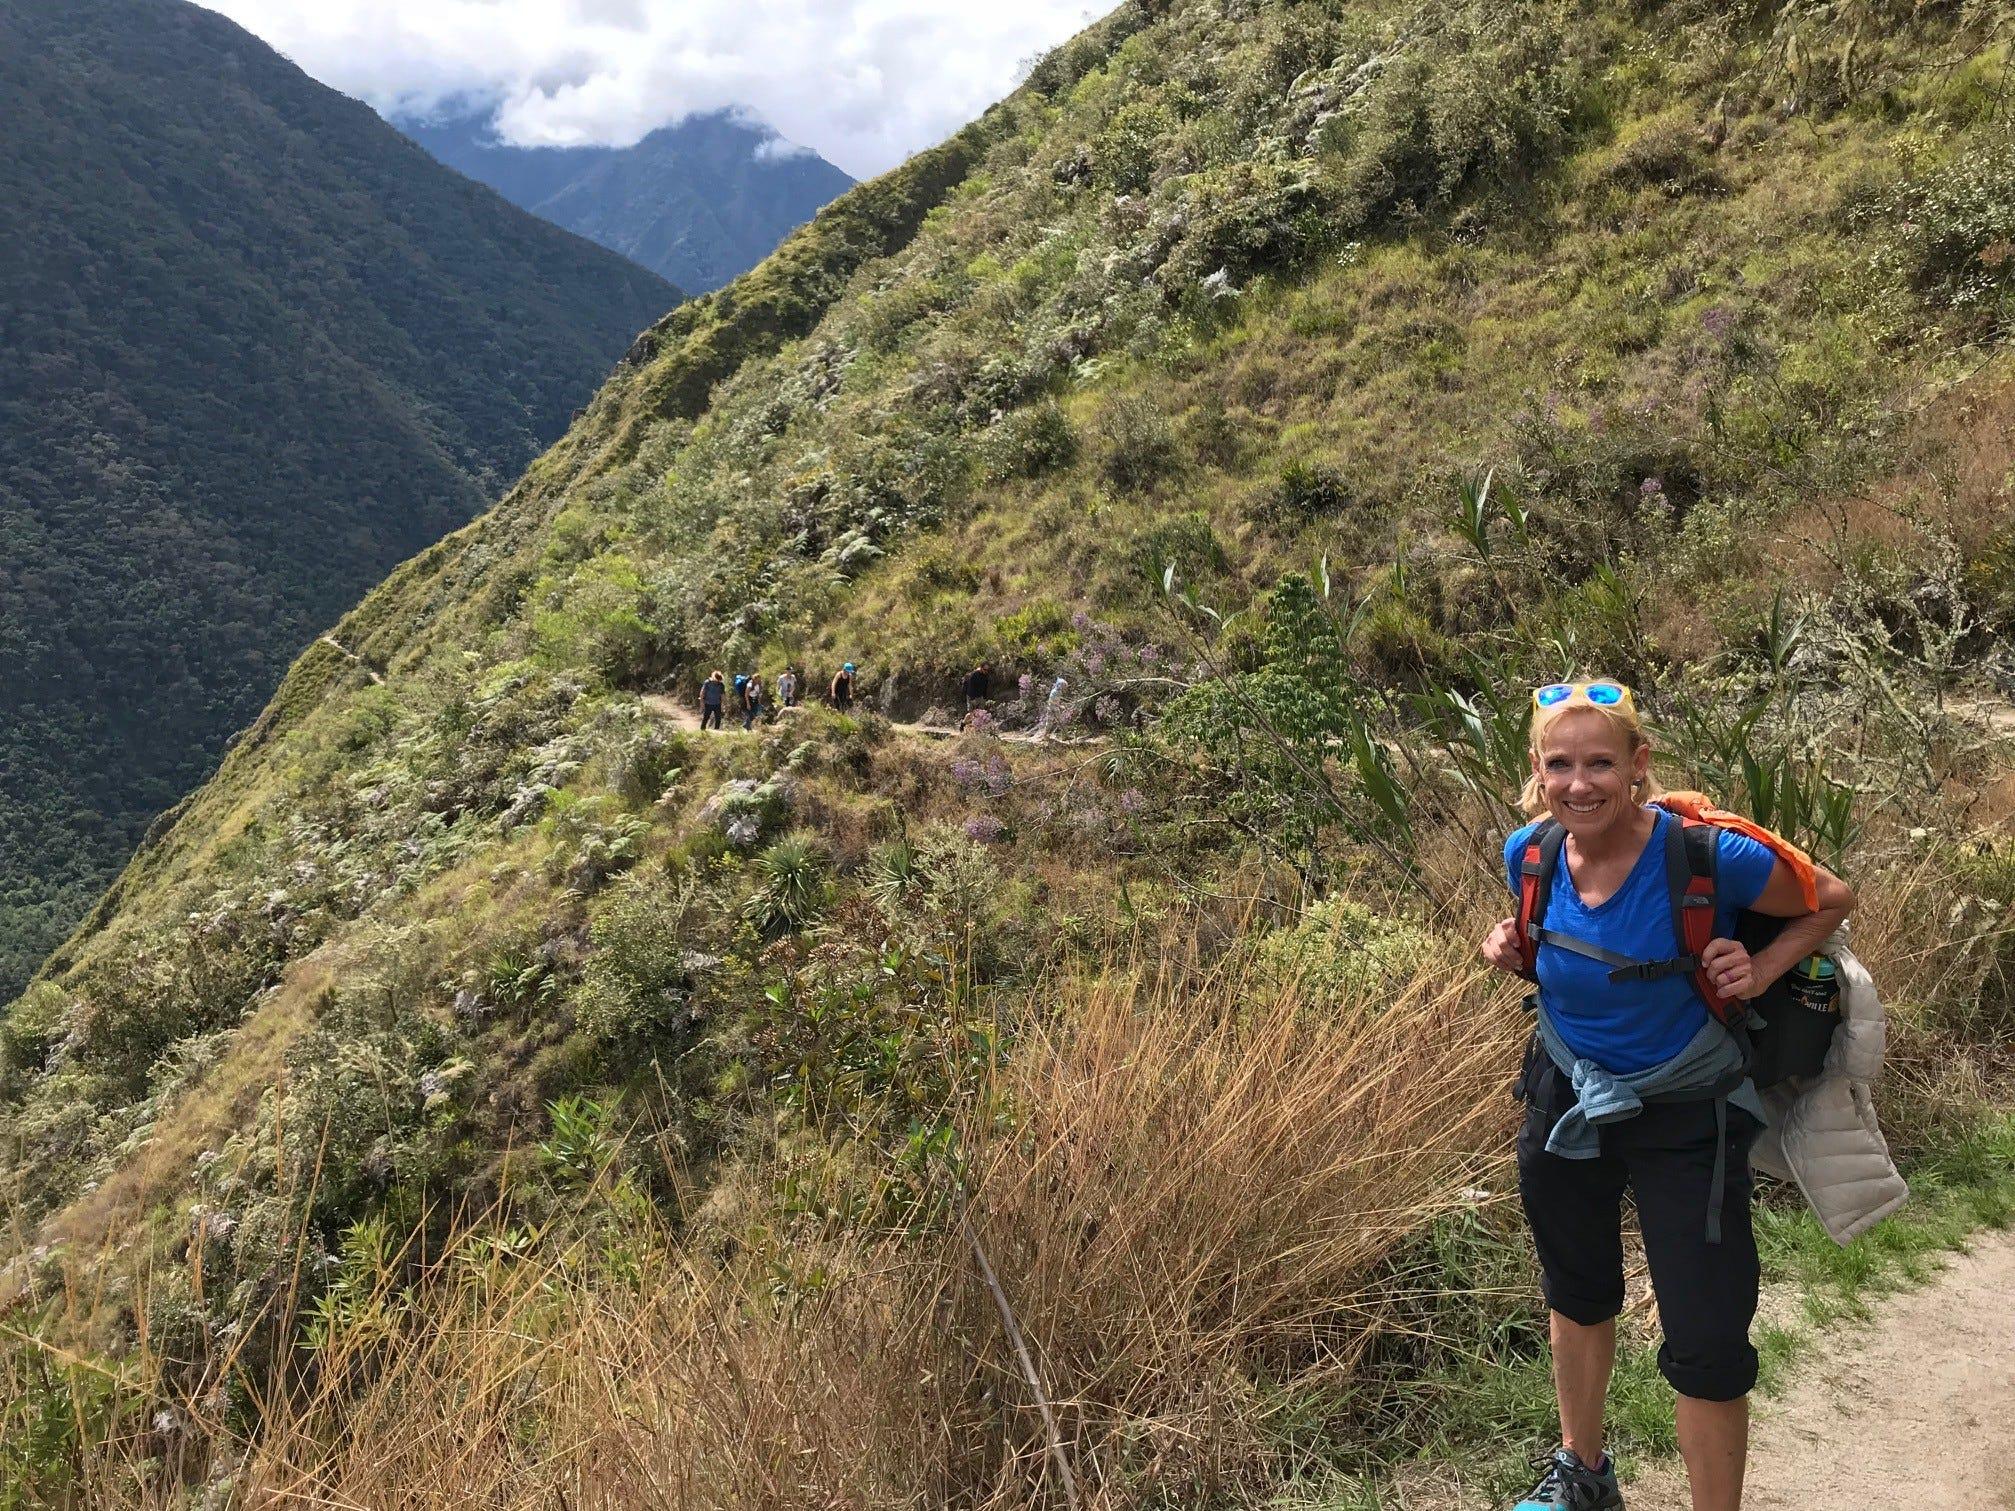 Kirby Adams hiking the Inca Trail